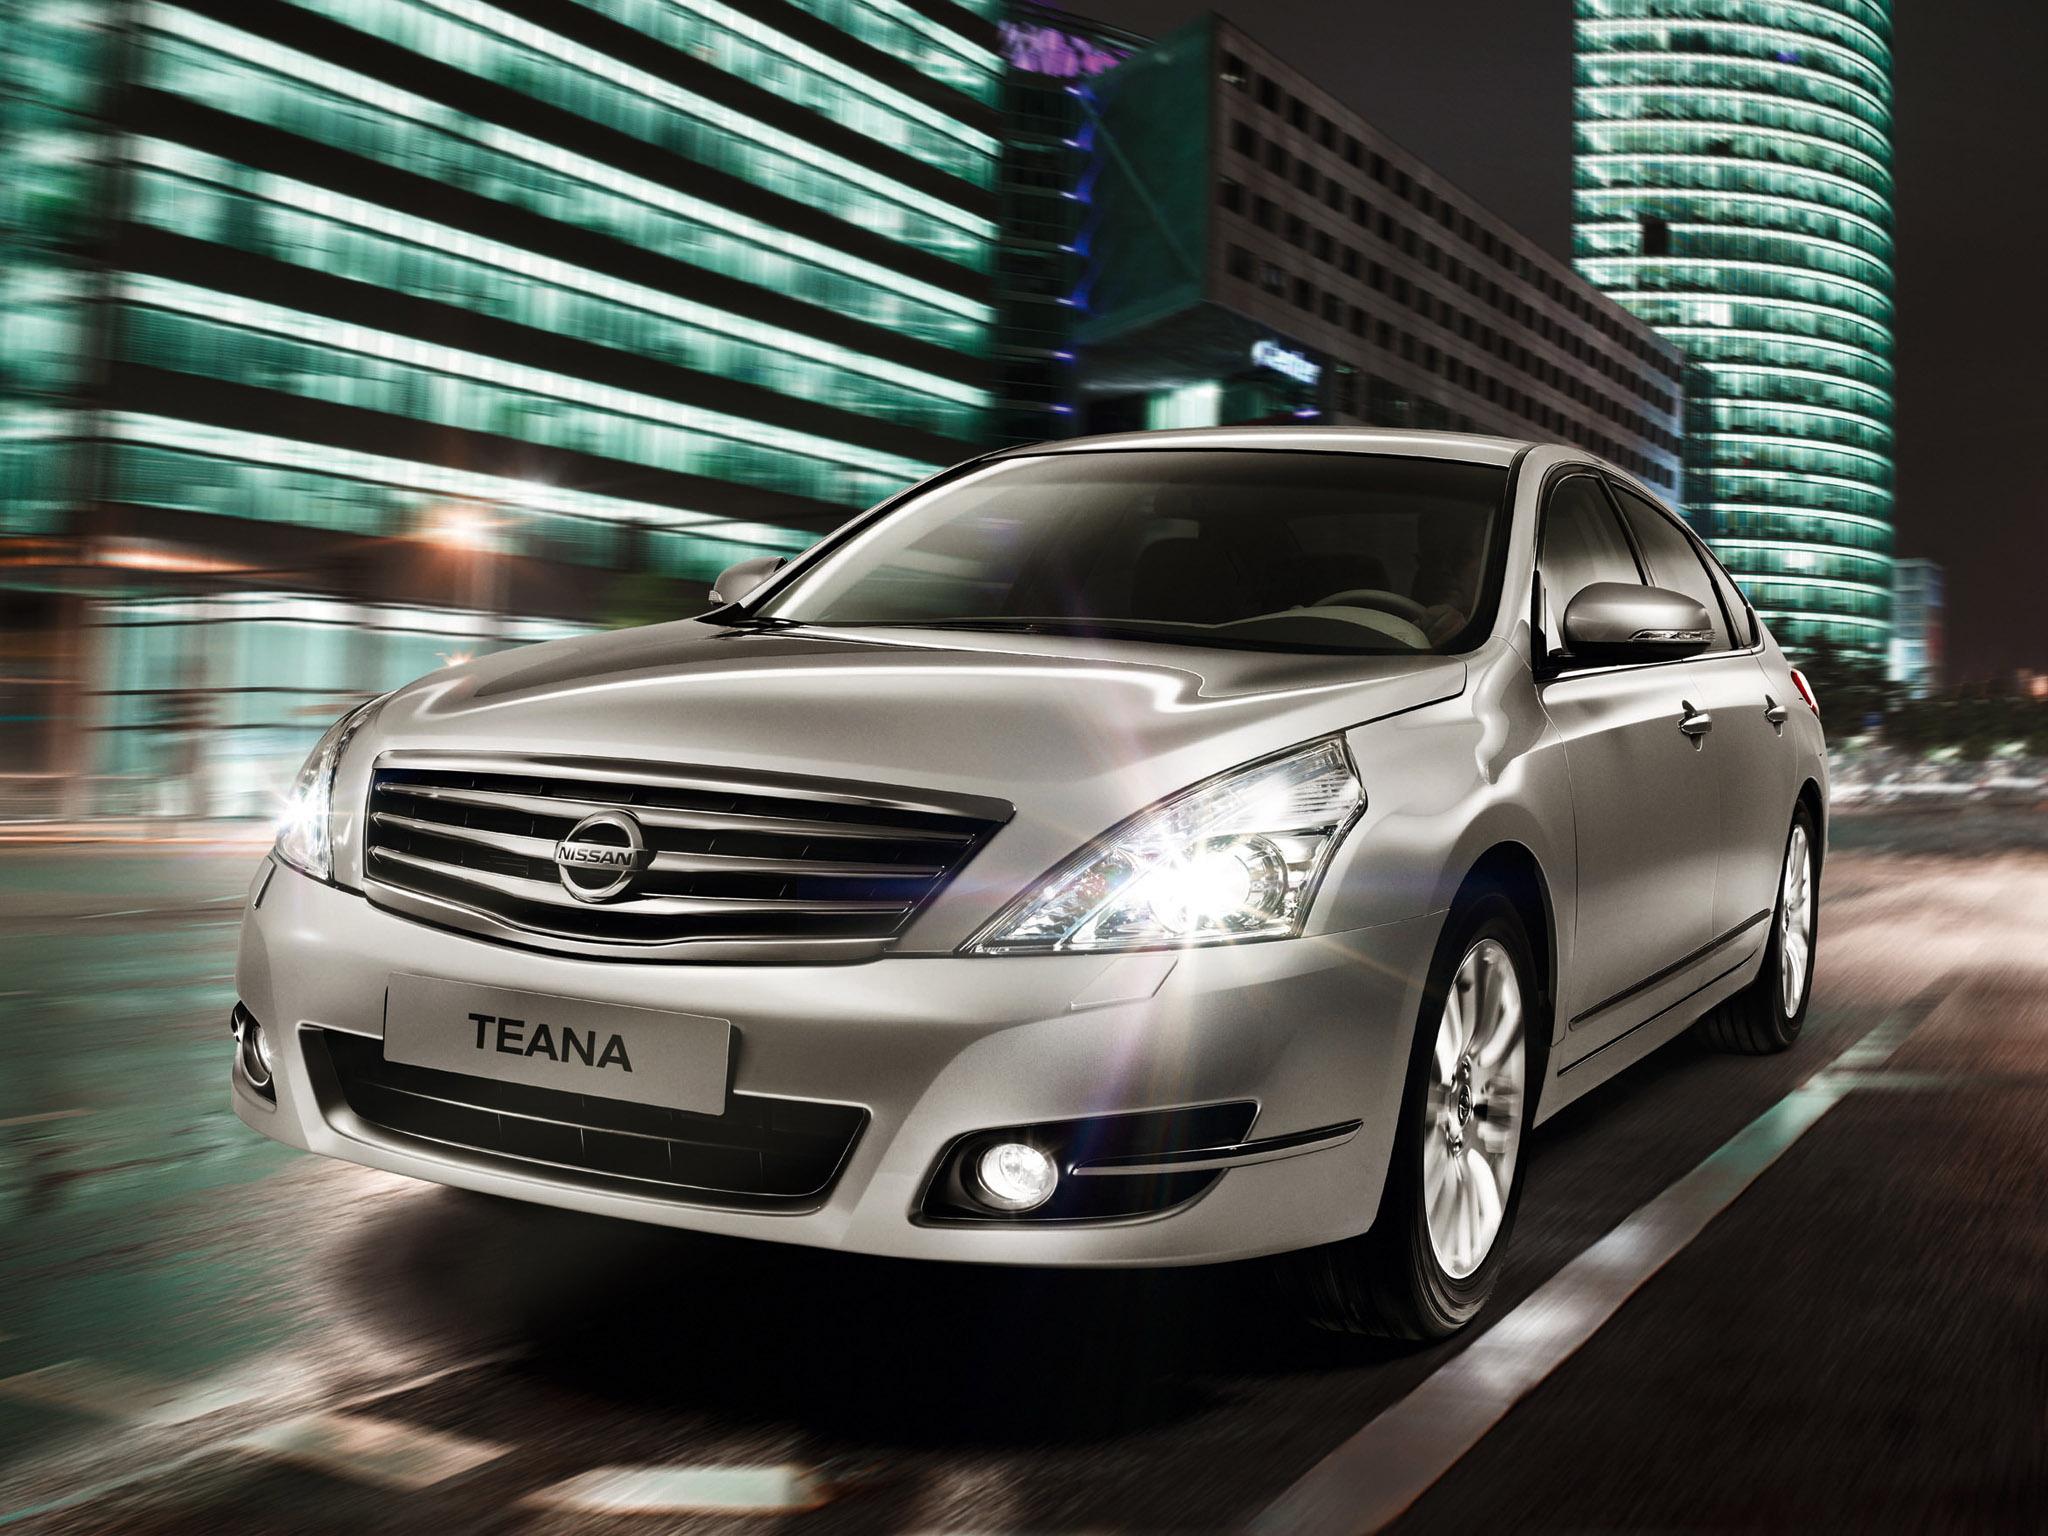 Nissan Teana 2013 otomobil